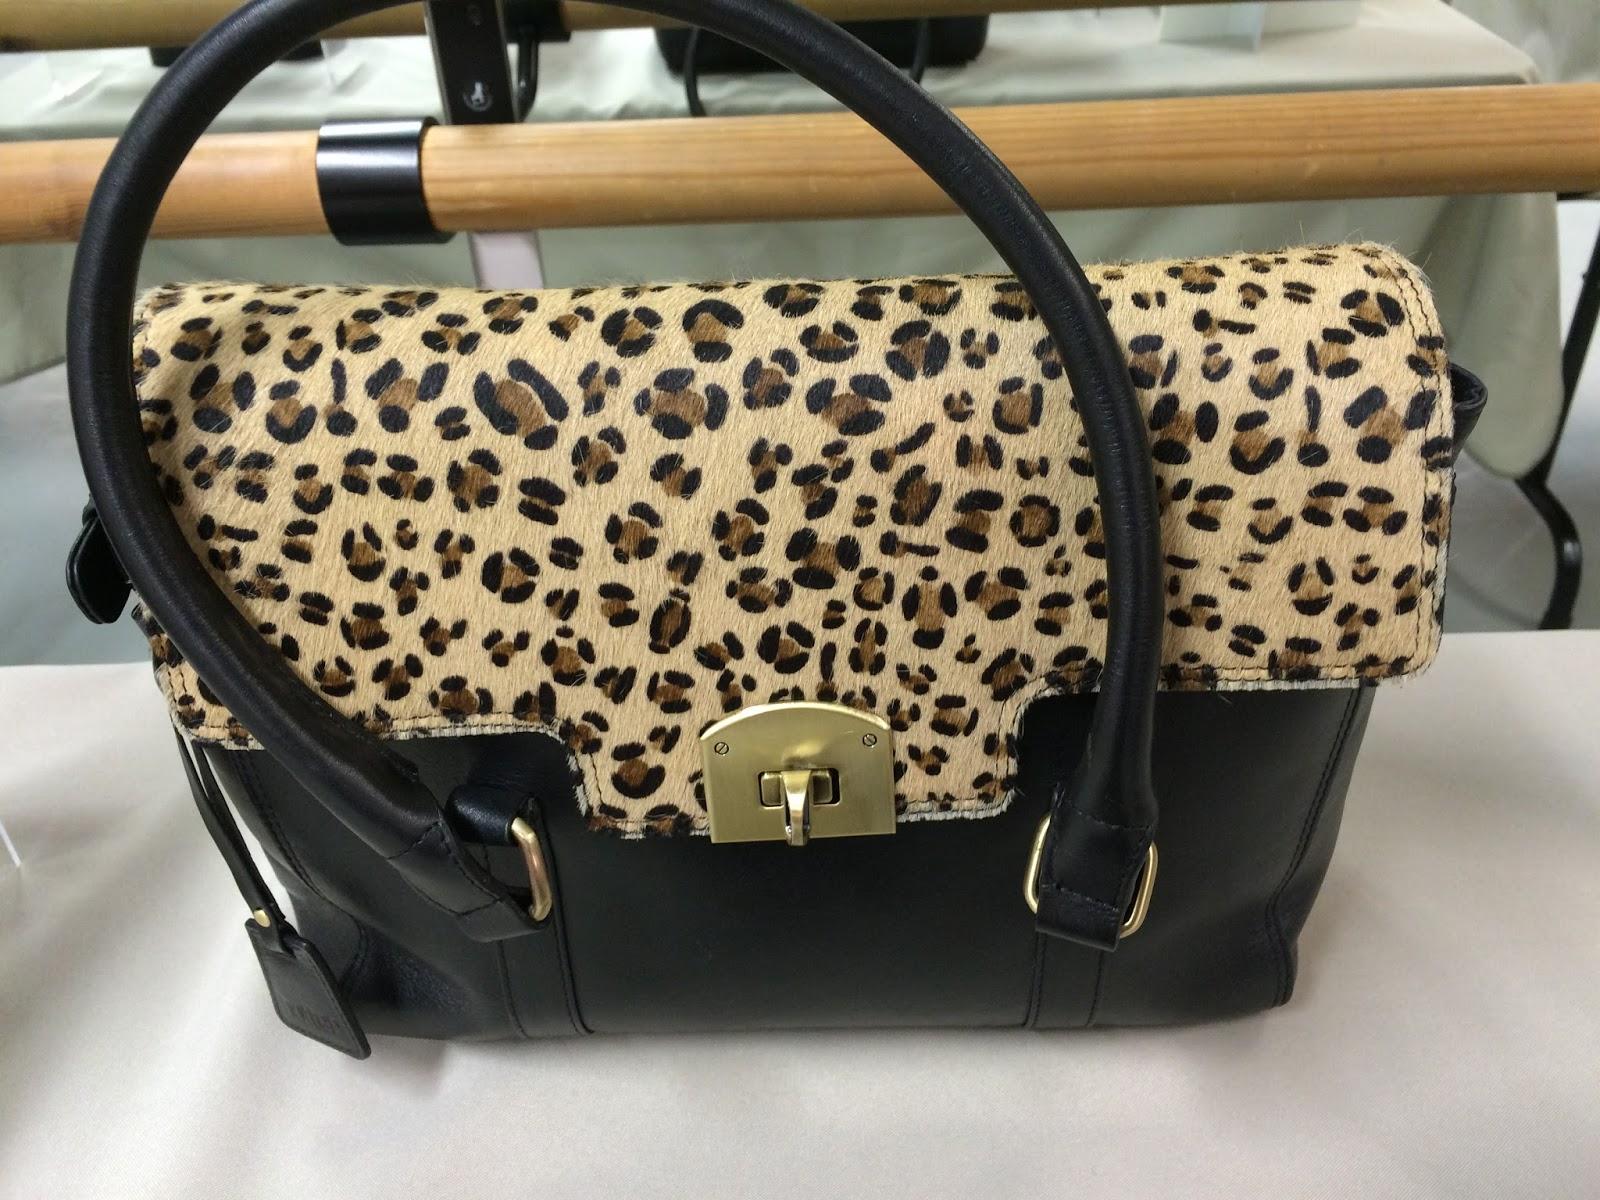 Hotter Gb En Accessories Handbags Chelsea Purse